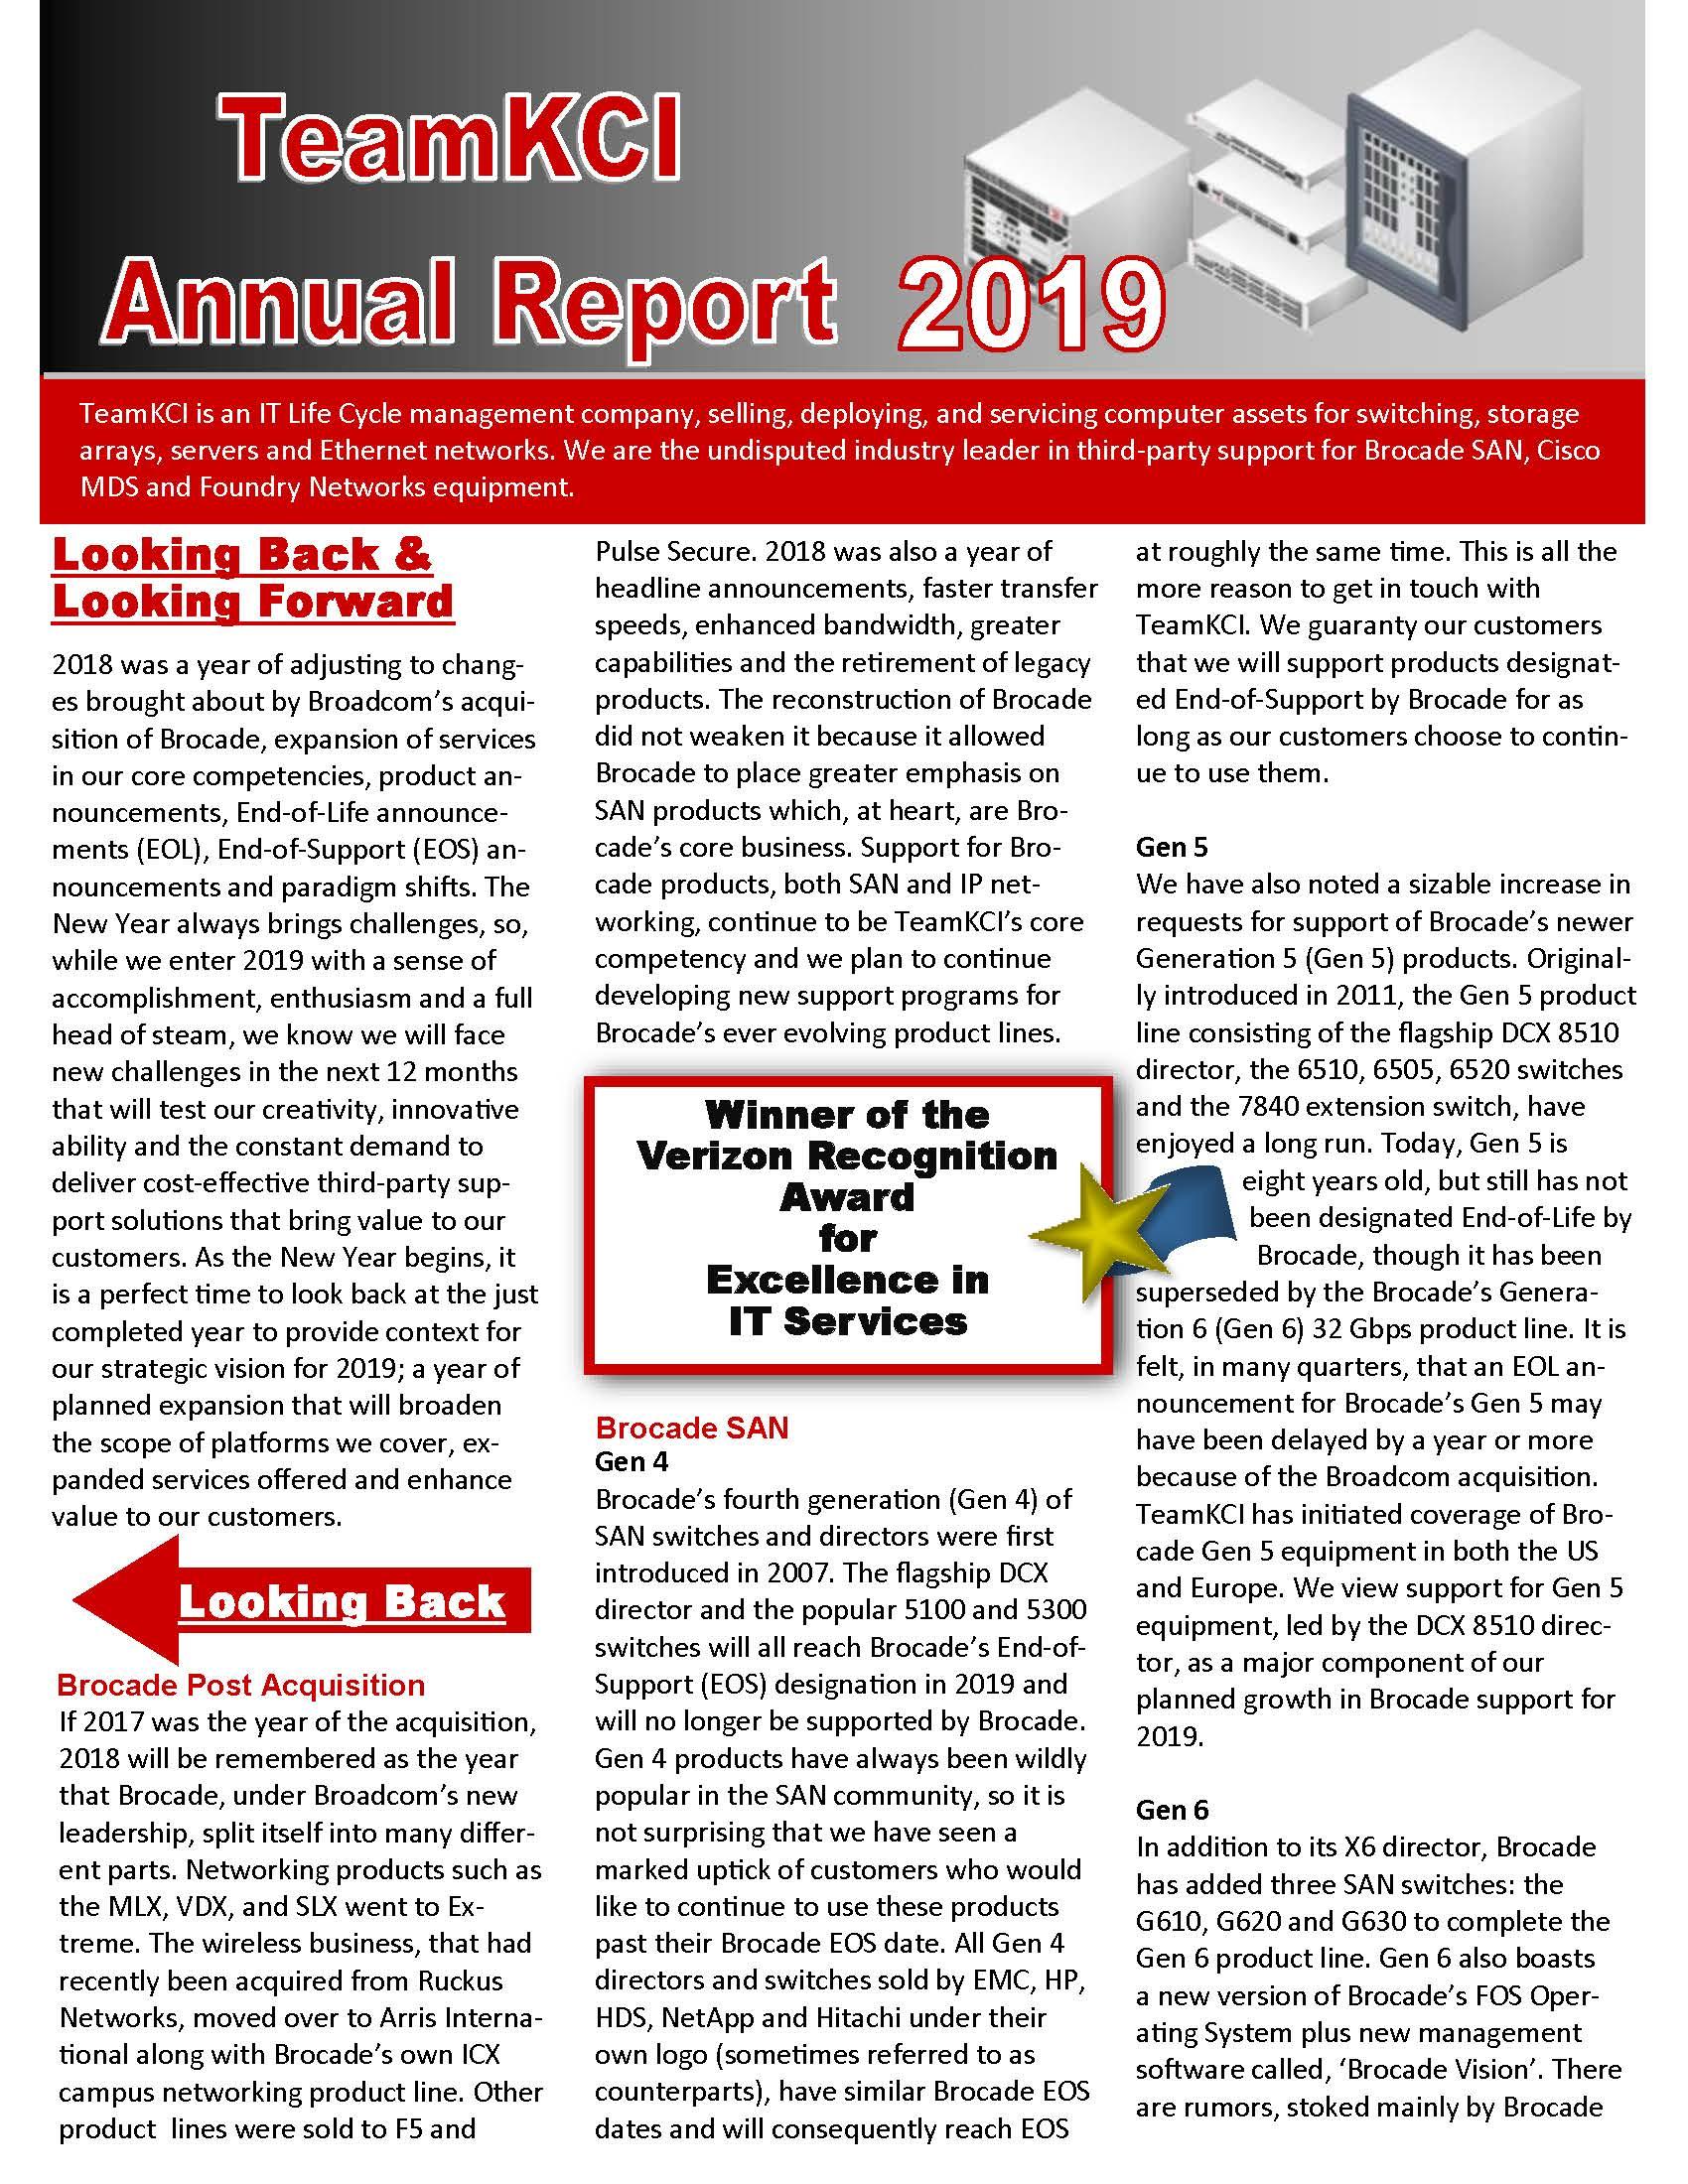 TeamKCI 2019 Annual Report – TeamKCI